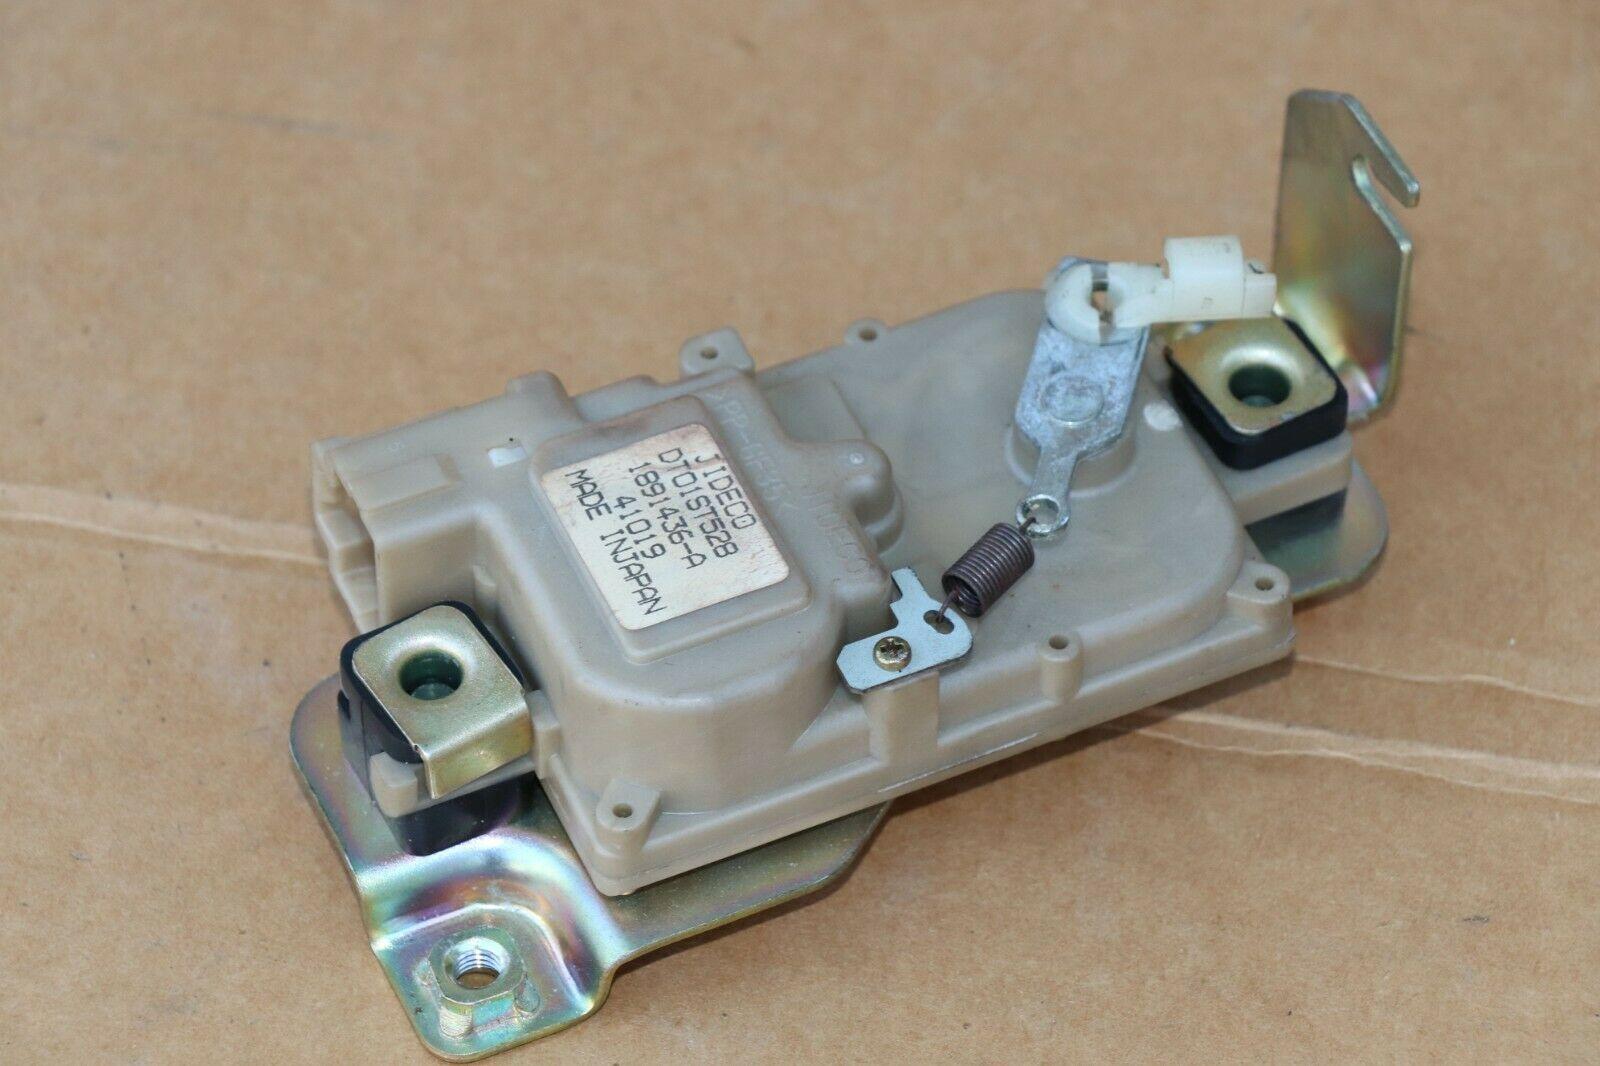 04-08 Nissan 350Z Convertible Tonneau Storage Cover Lock Release Actuator